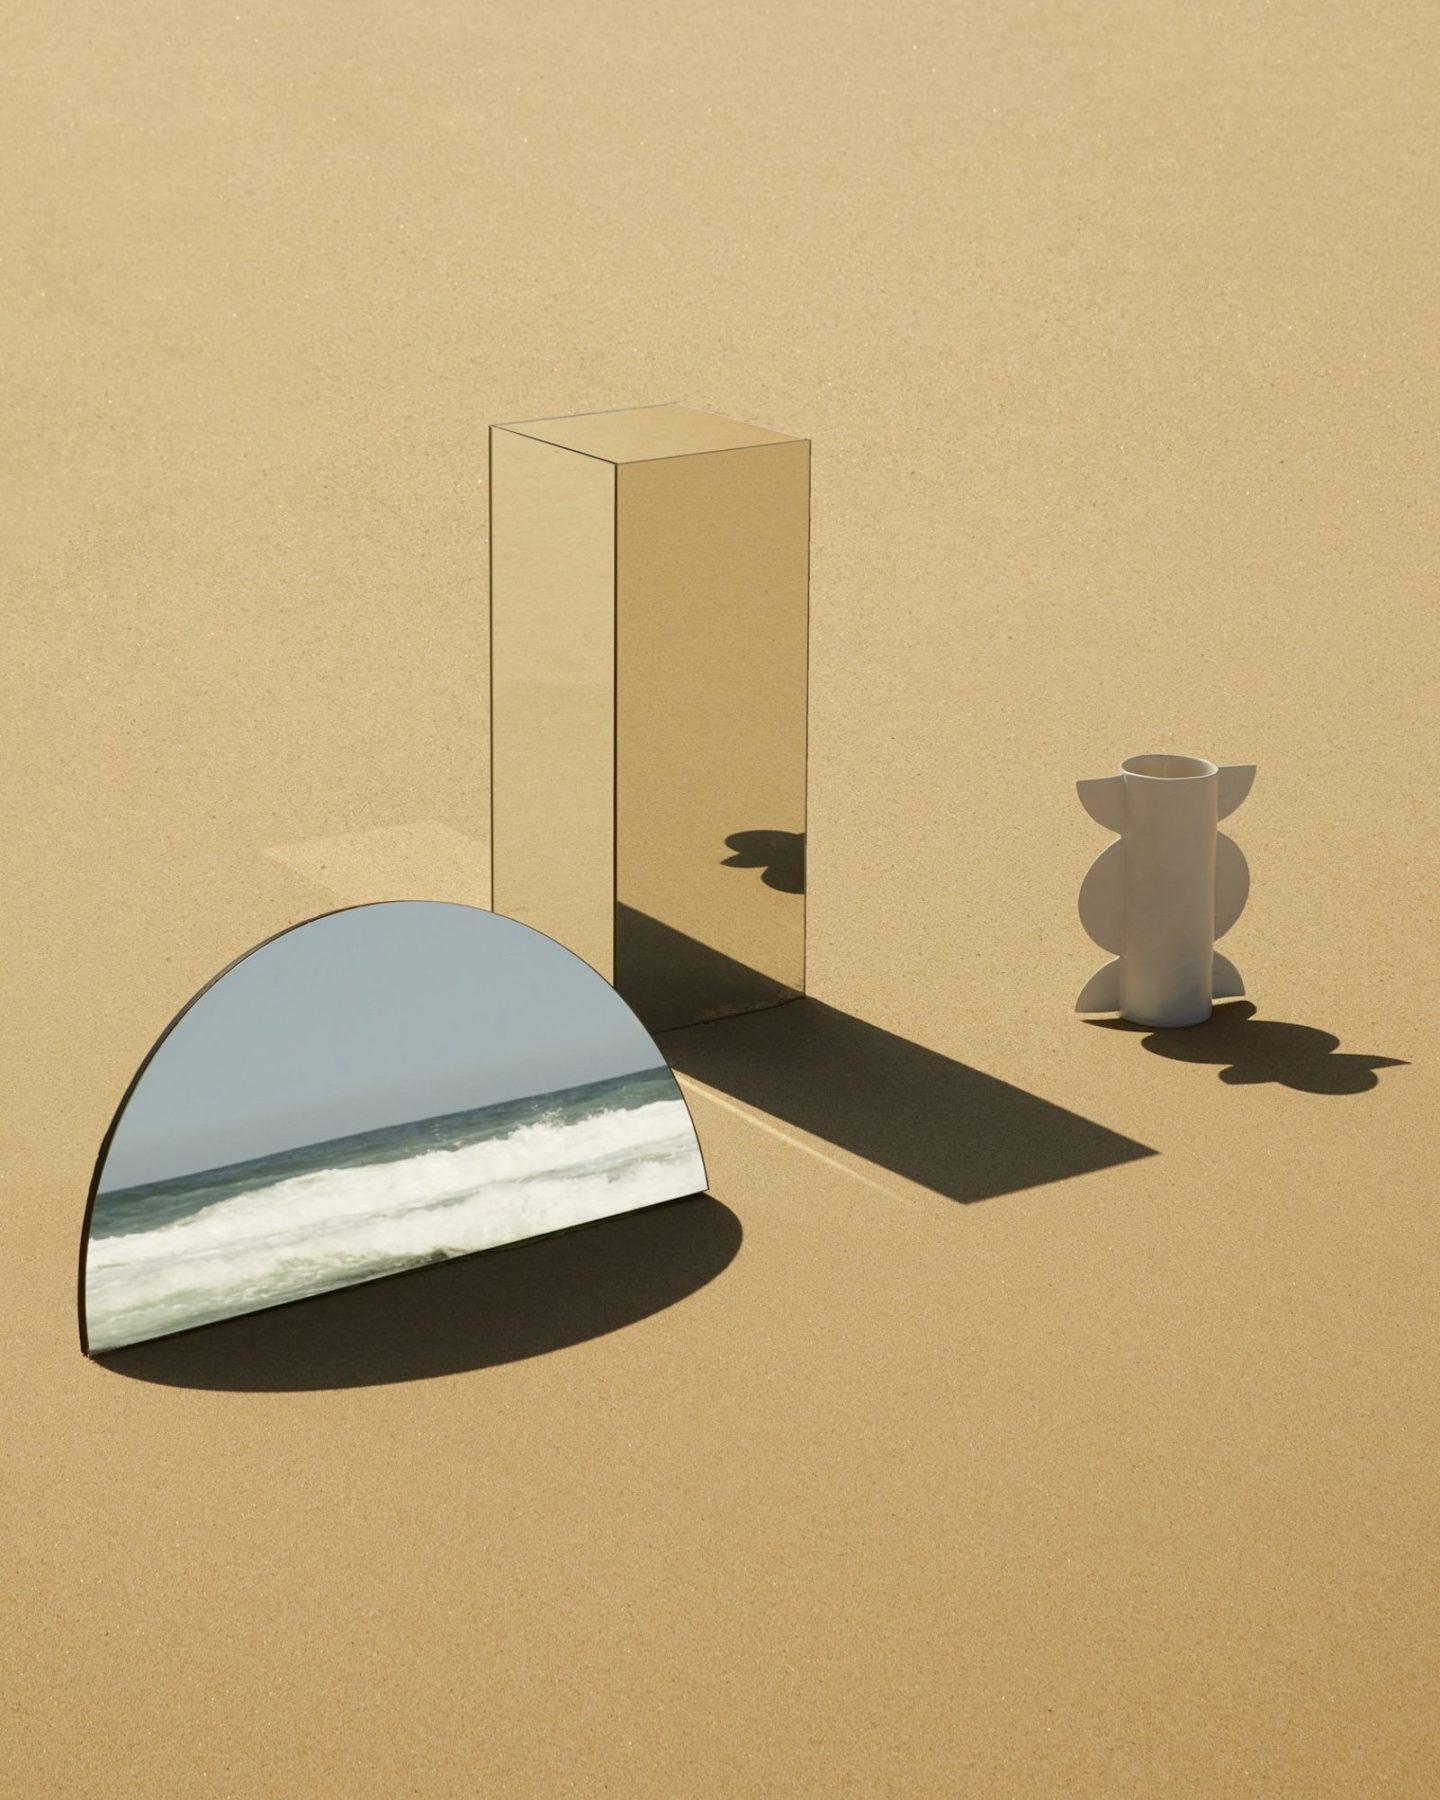 ignant-design-sarah-ellison-the-new-wave-020-1440x1800